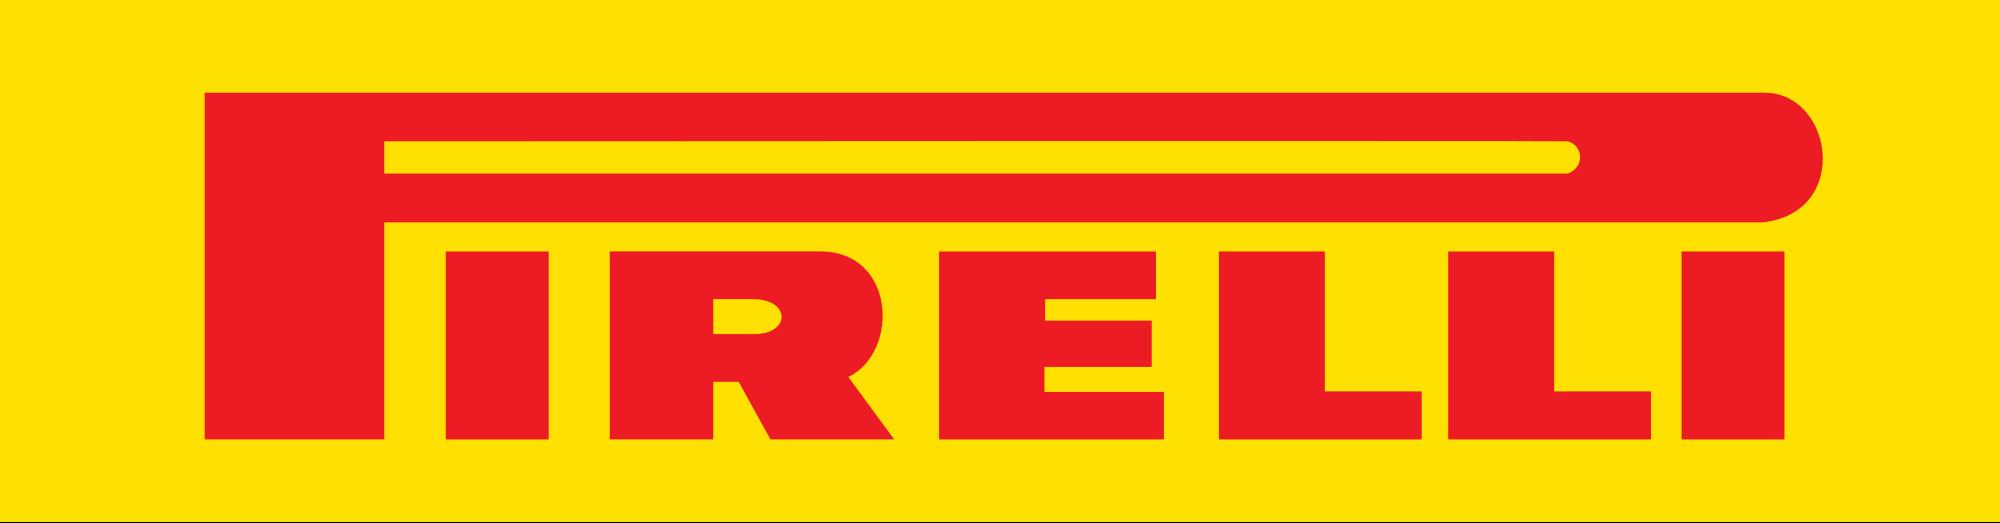 Pirelli Motorrad Reifen Tirol